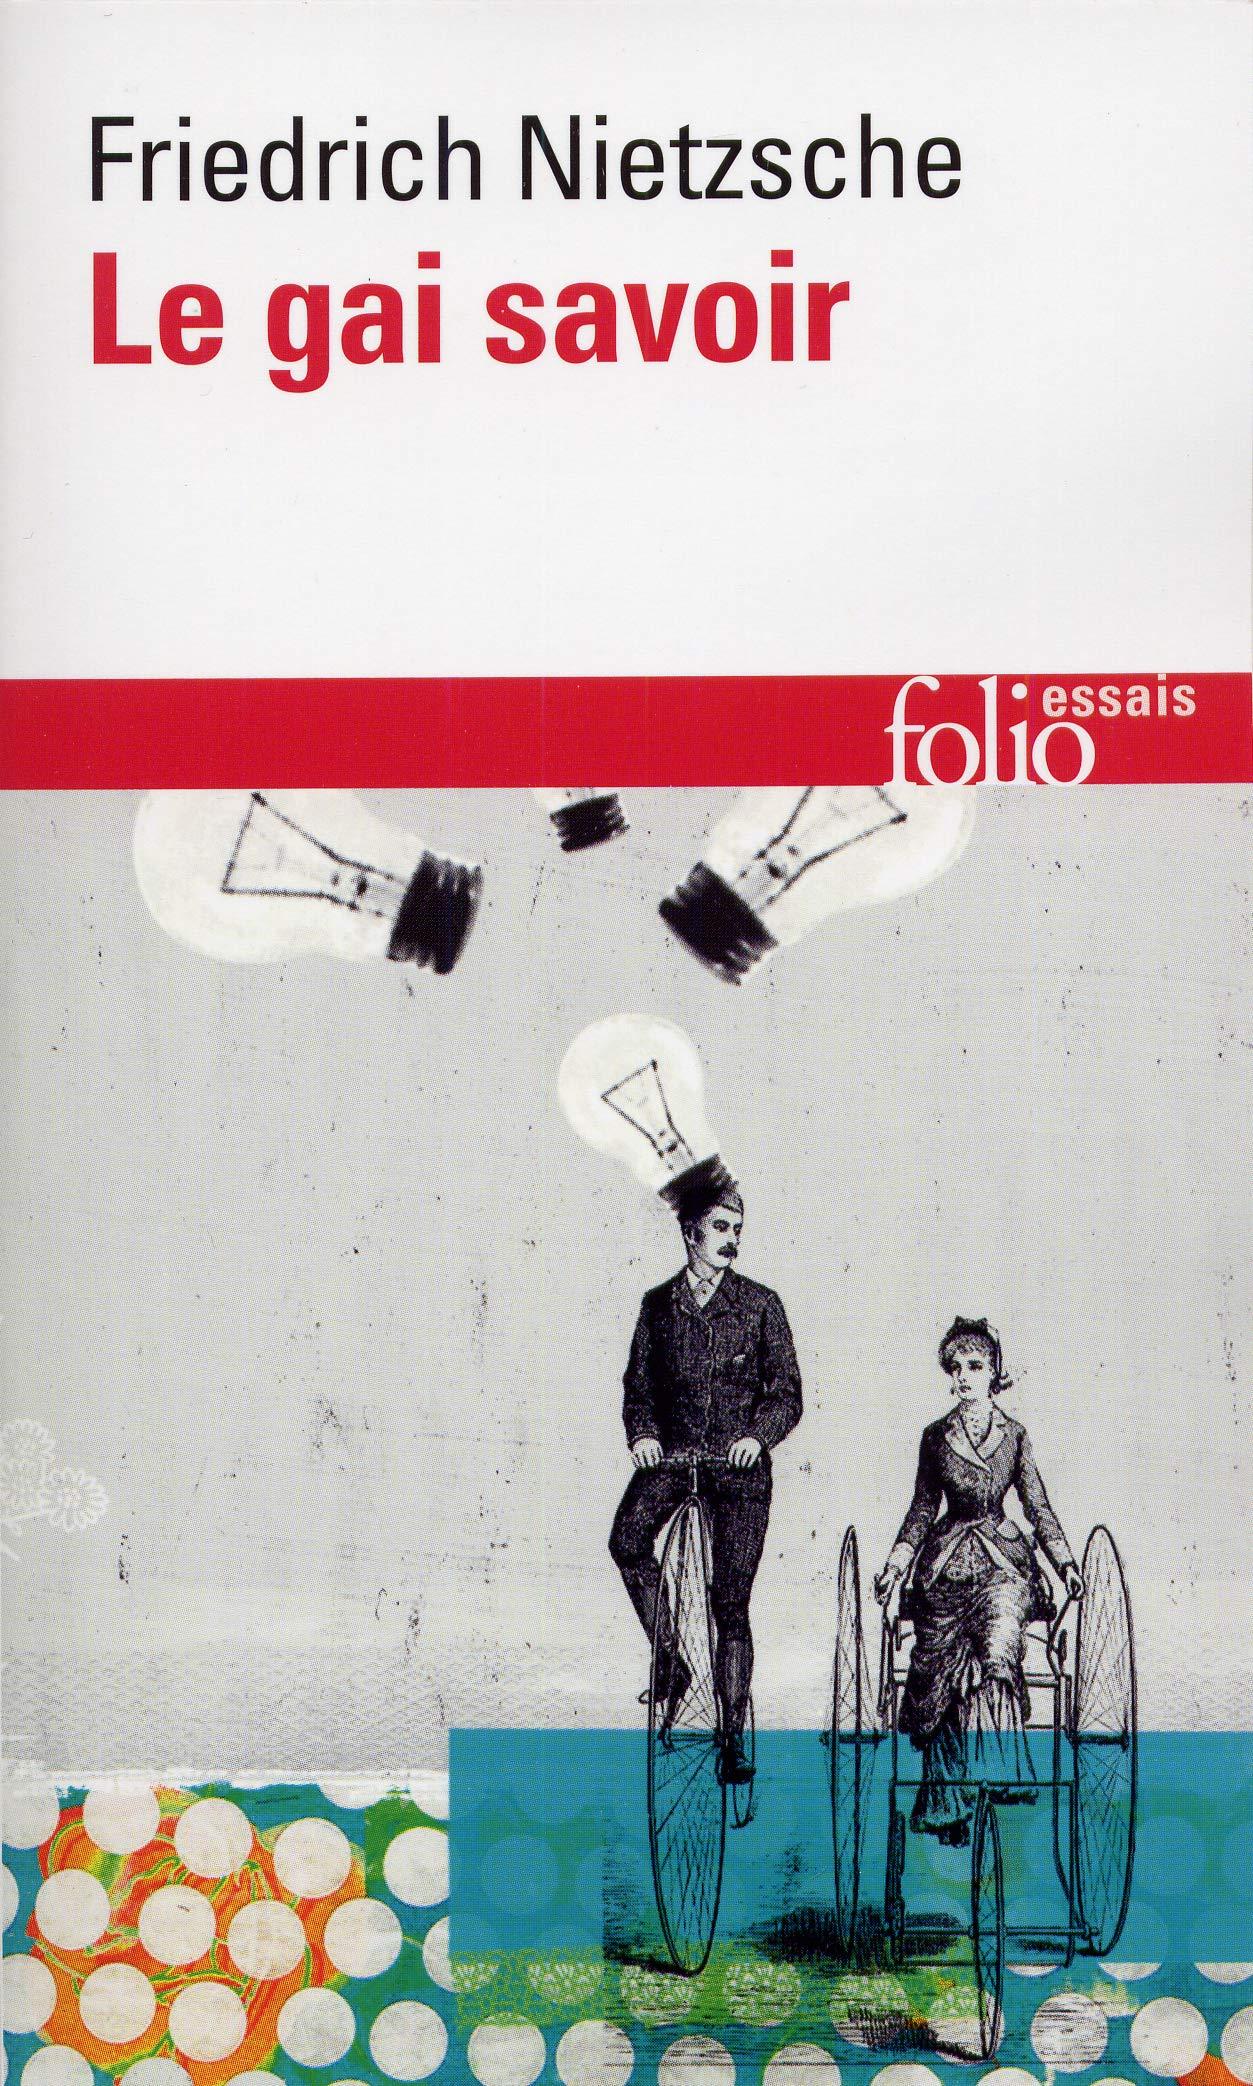 Gai Savoir (Folio Essais) (French Edition): Nietzsche, Friedrich Wilhelm:  9782070325405: Amazon.com: Books